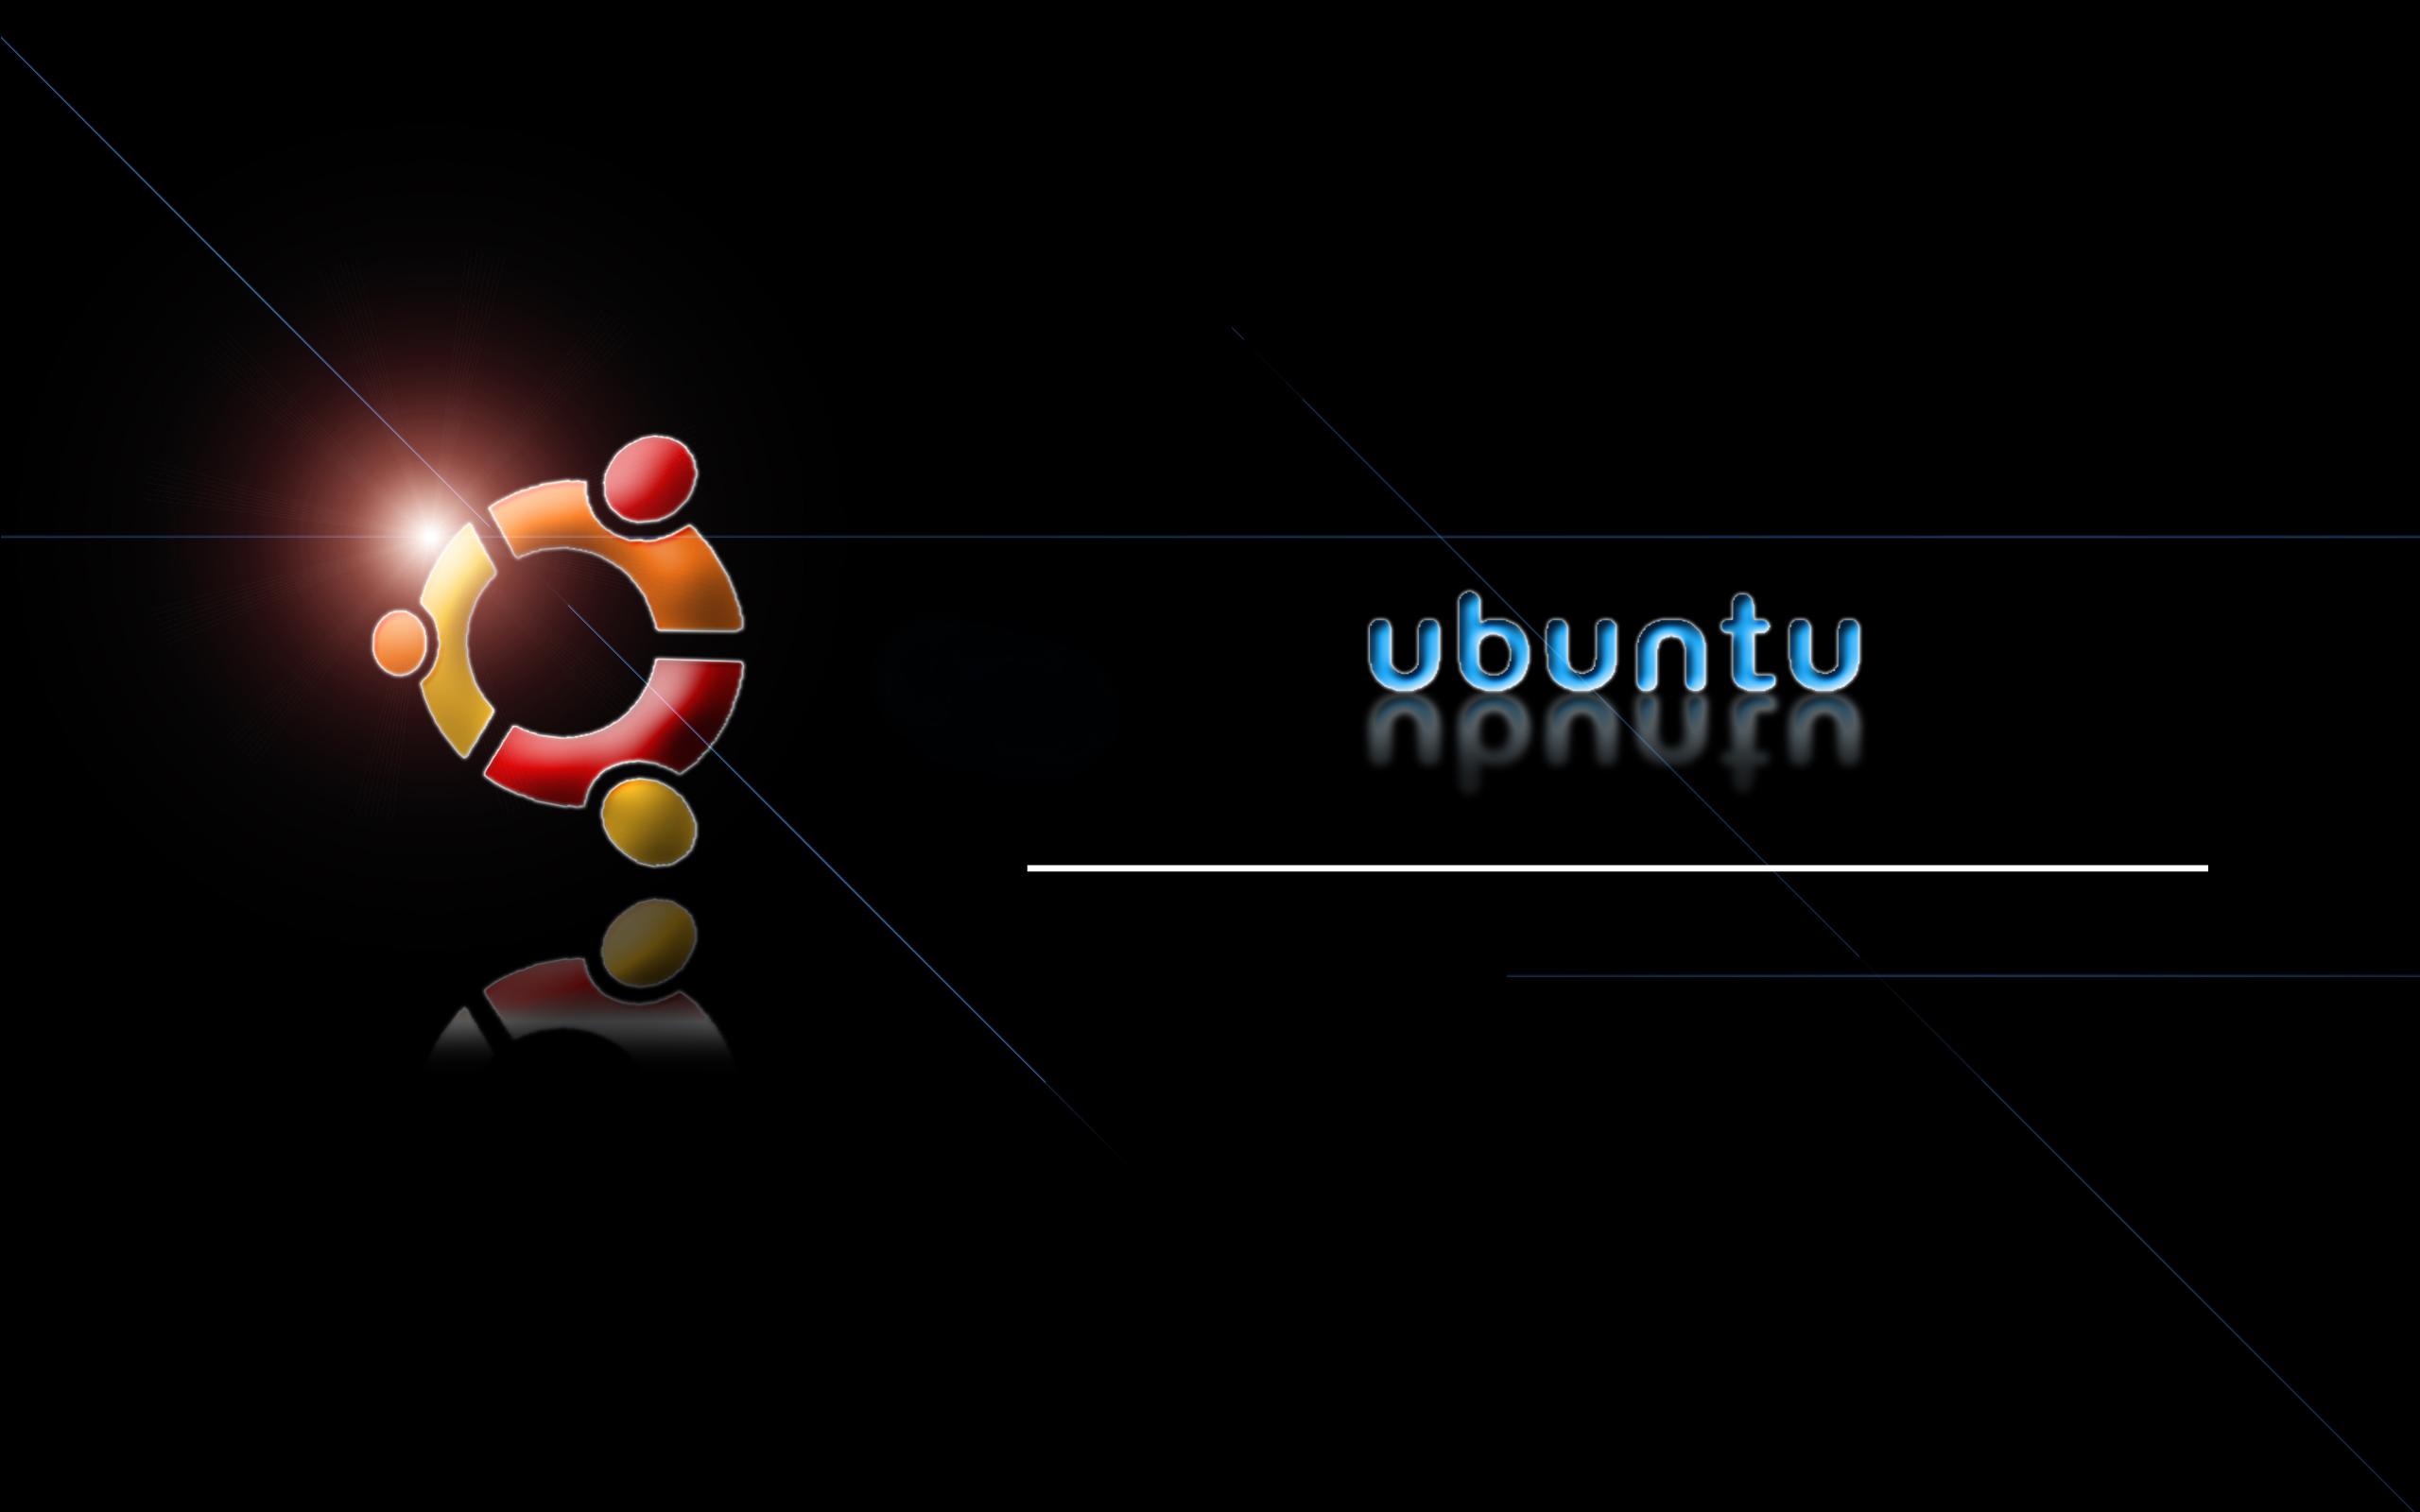 Linux Wallpapers Ubuntu Wallpaper Desktop HD Download Dream 2560x1600